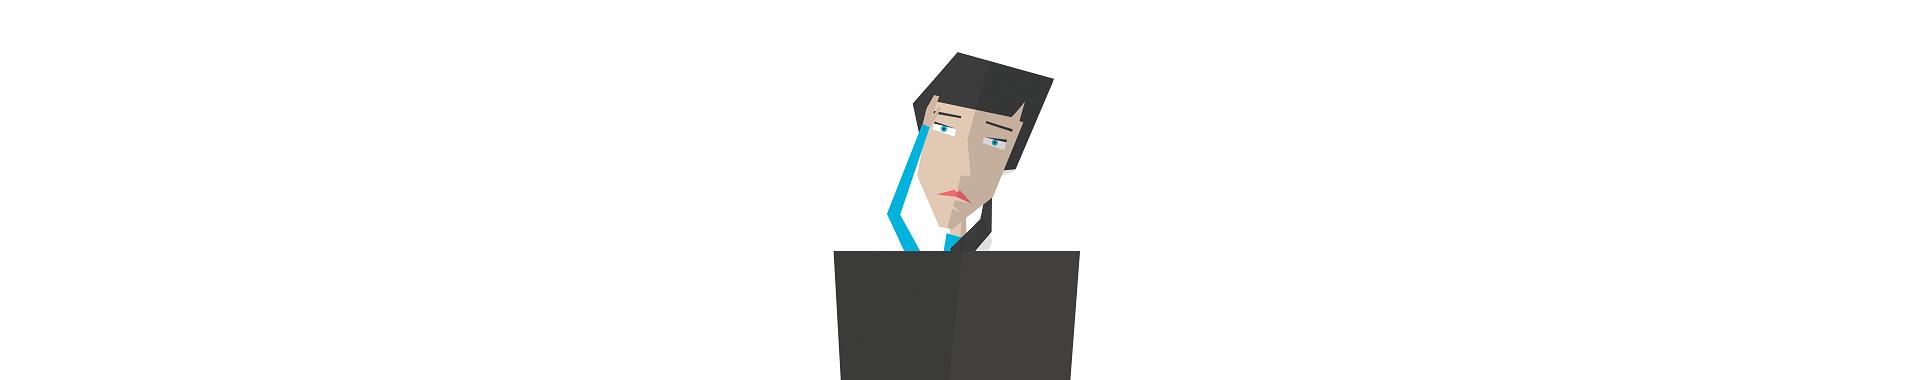 Bürokommunikation: E-Mail-Pannen rückgängig machen